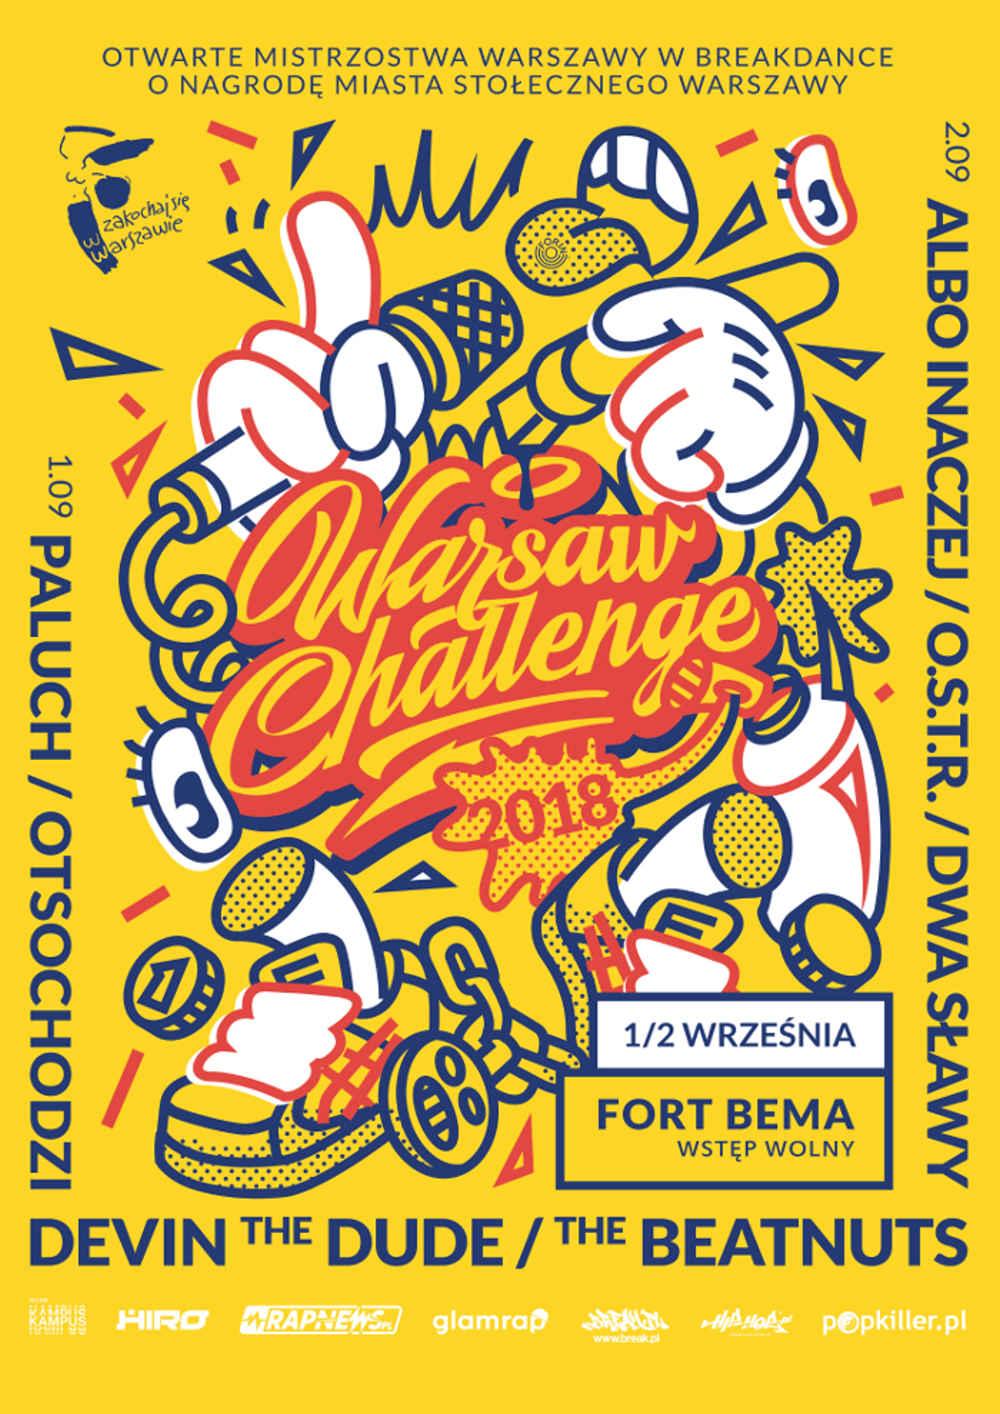 Warsaw Challenge 2018 plakat